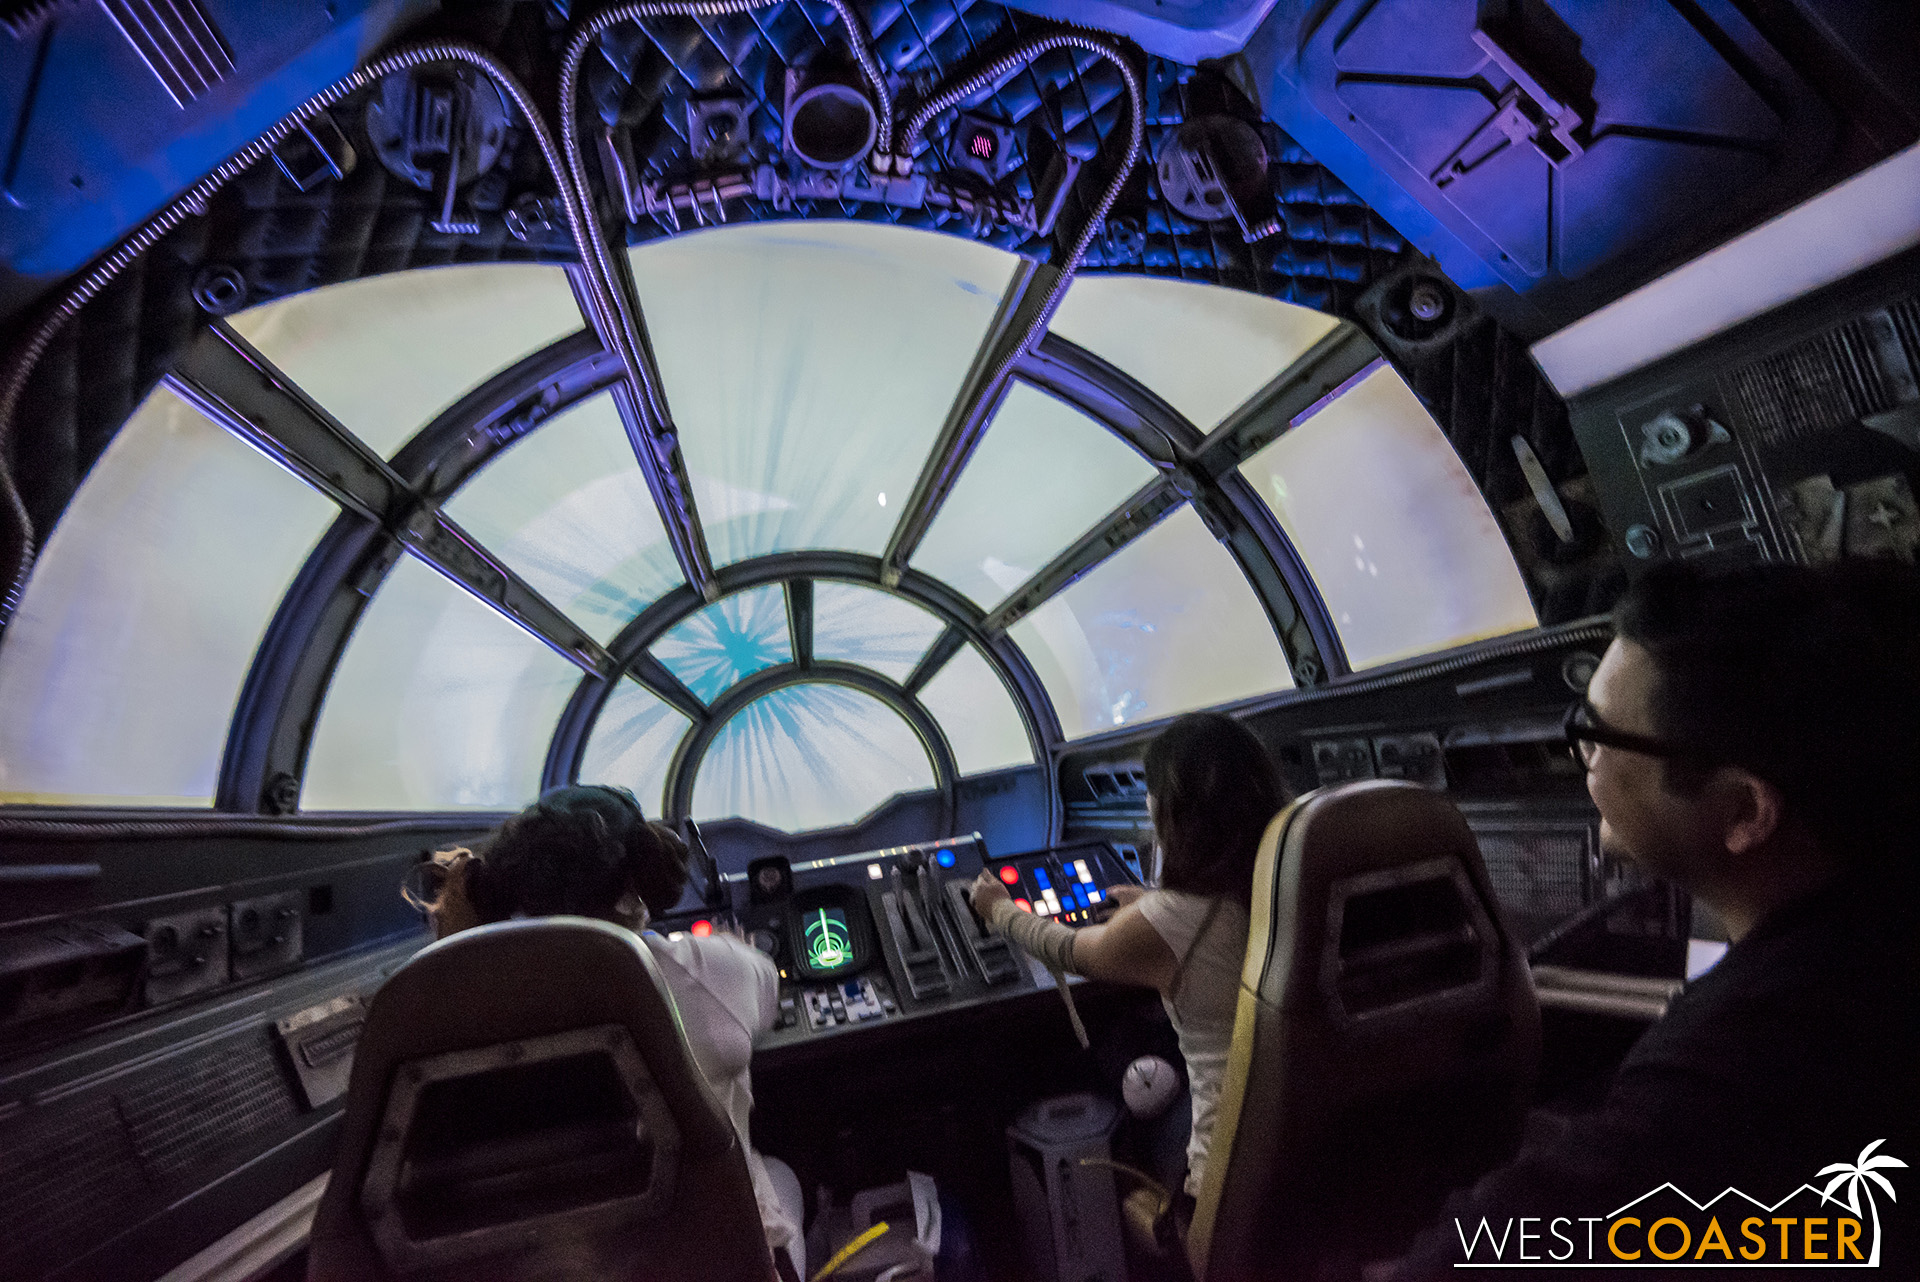 DLR-19_0606-D-Cockpit-0005.jpg